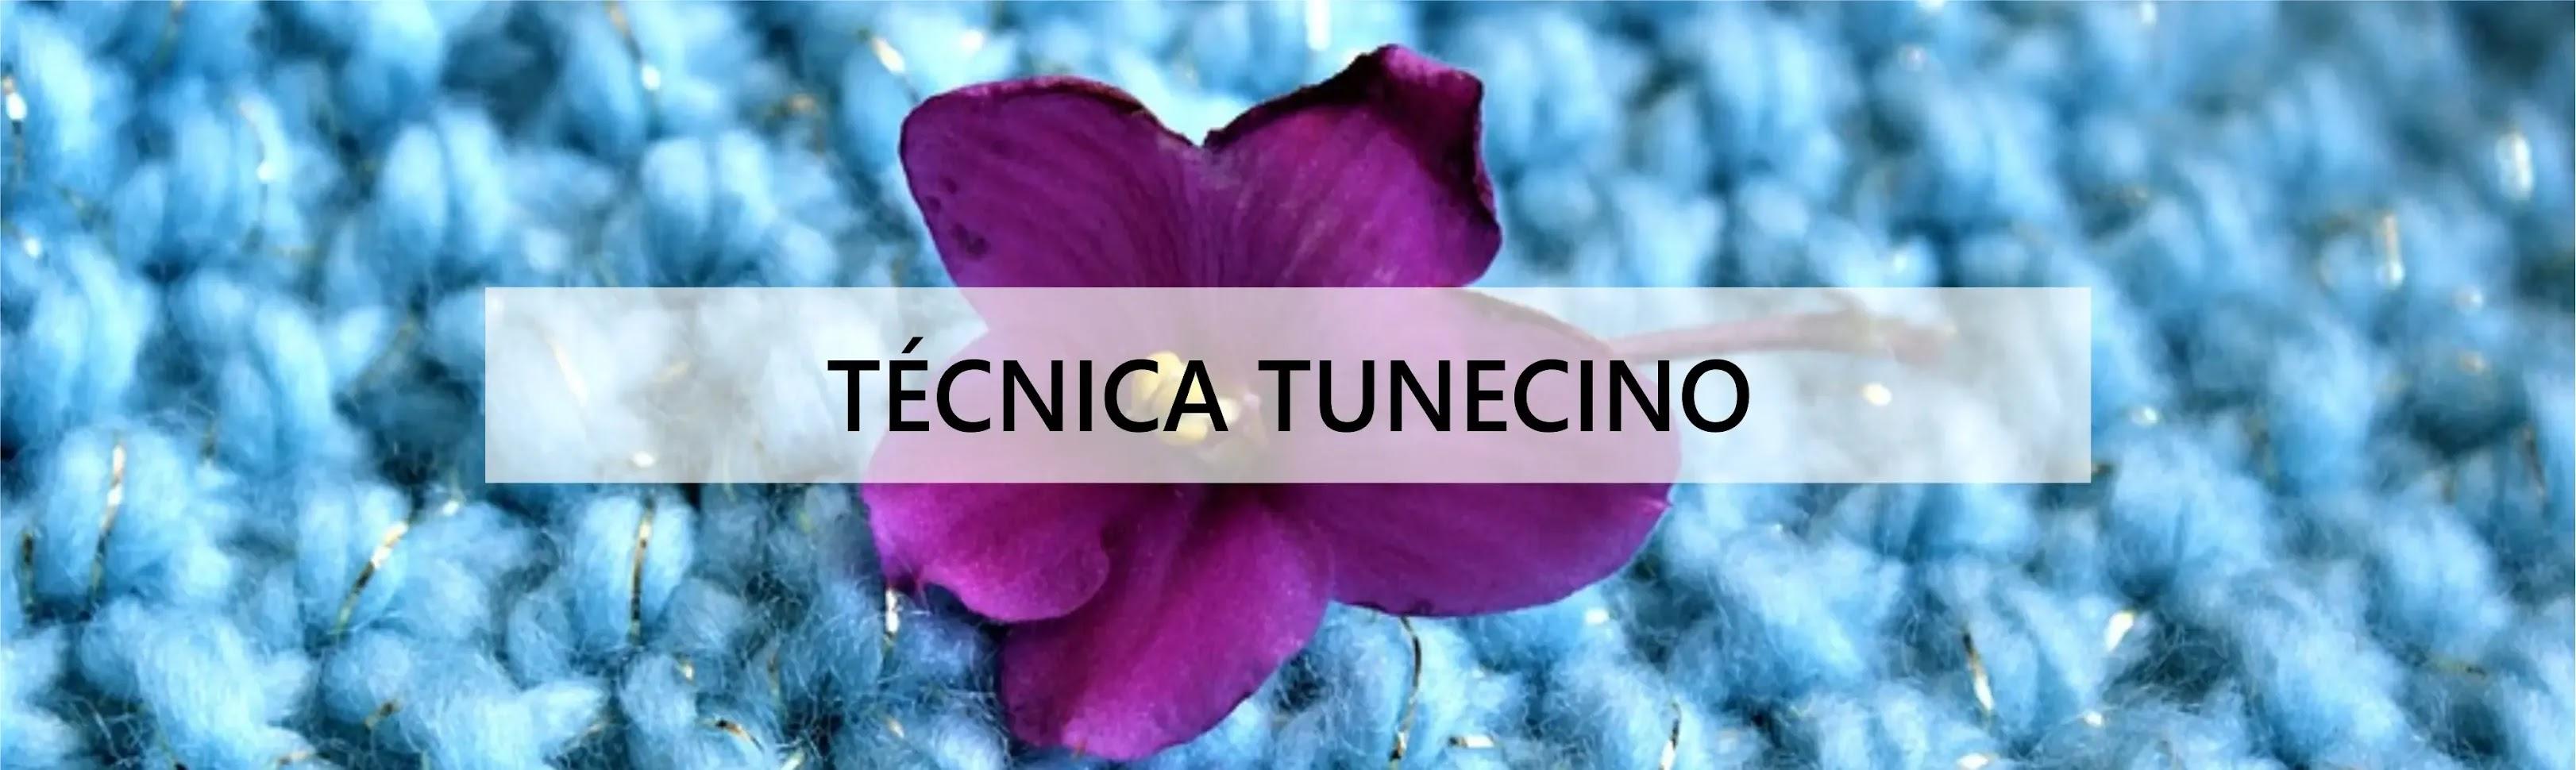 Técnica Tunecino